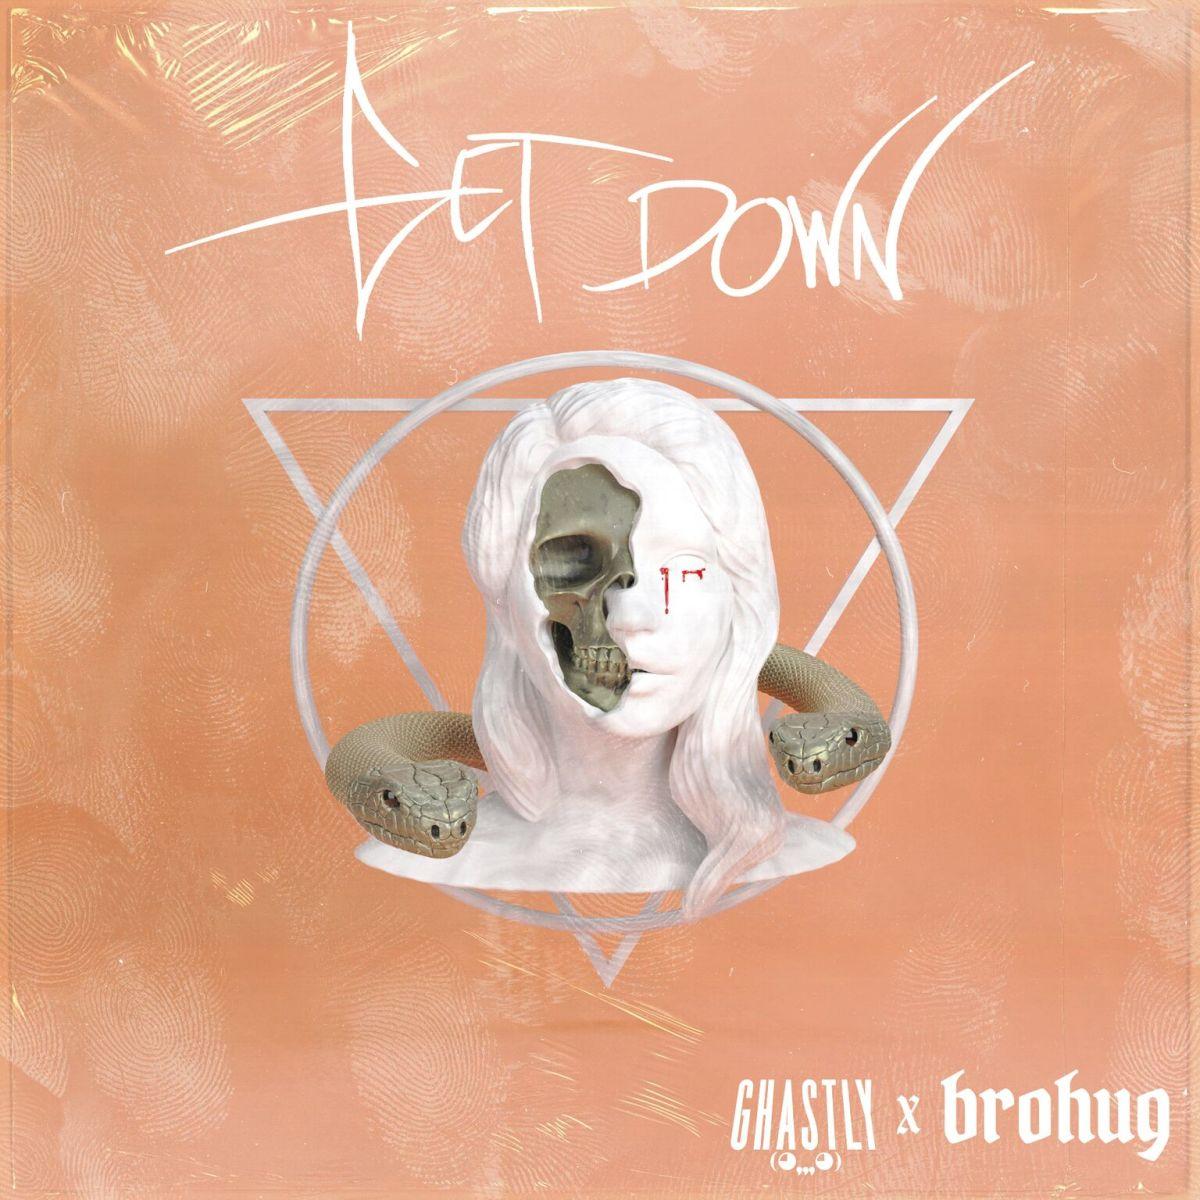 Ghastly BroHug Get Down Album Artwork